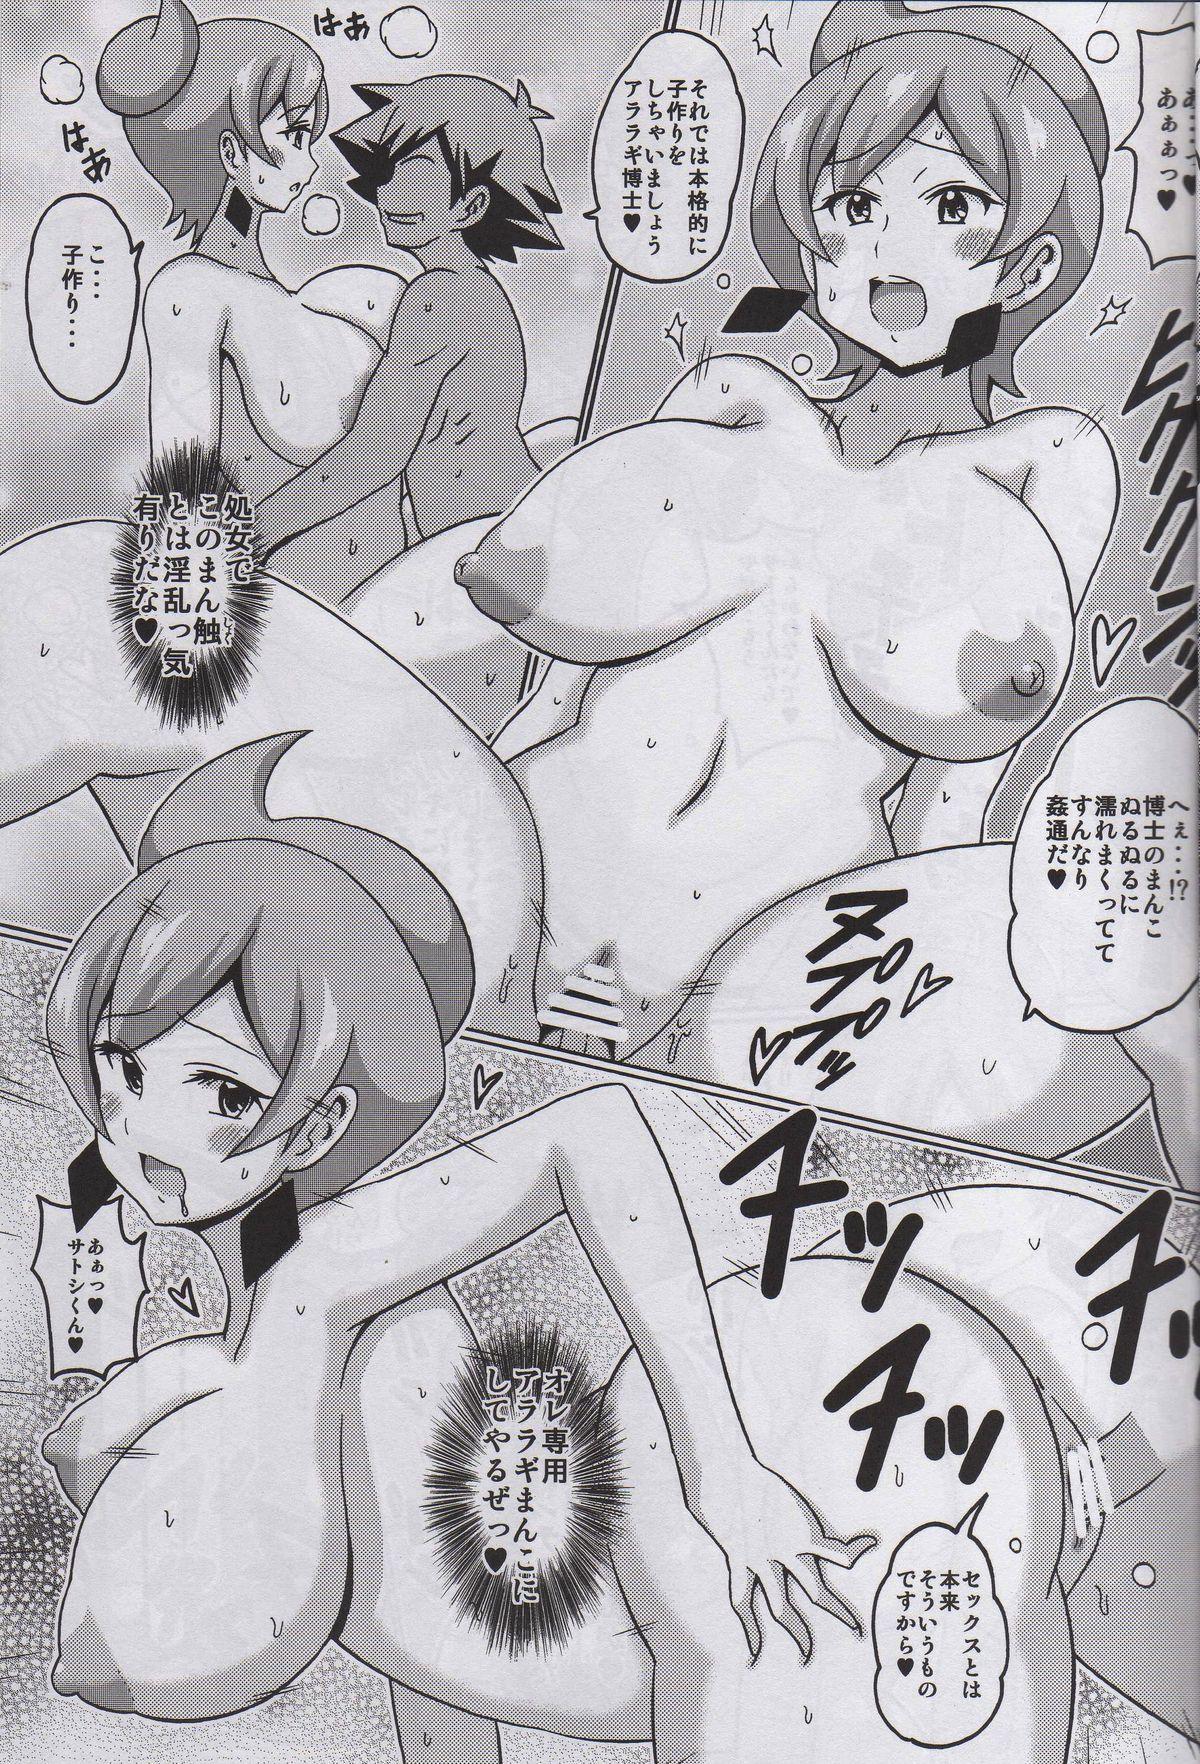 Araragi Hakase to Haruka no Hon 6